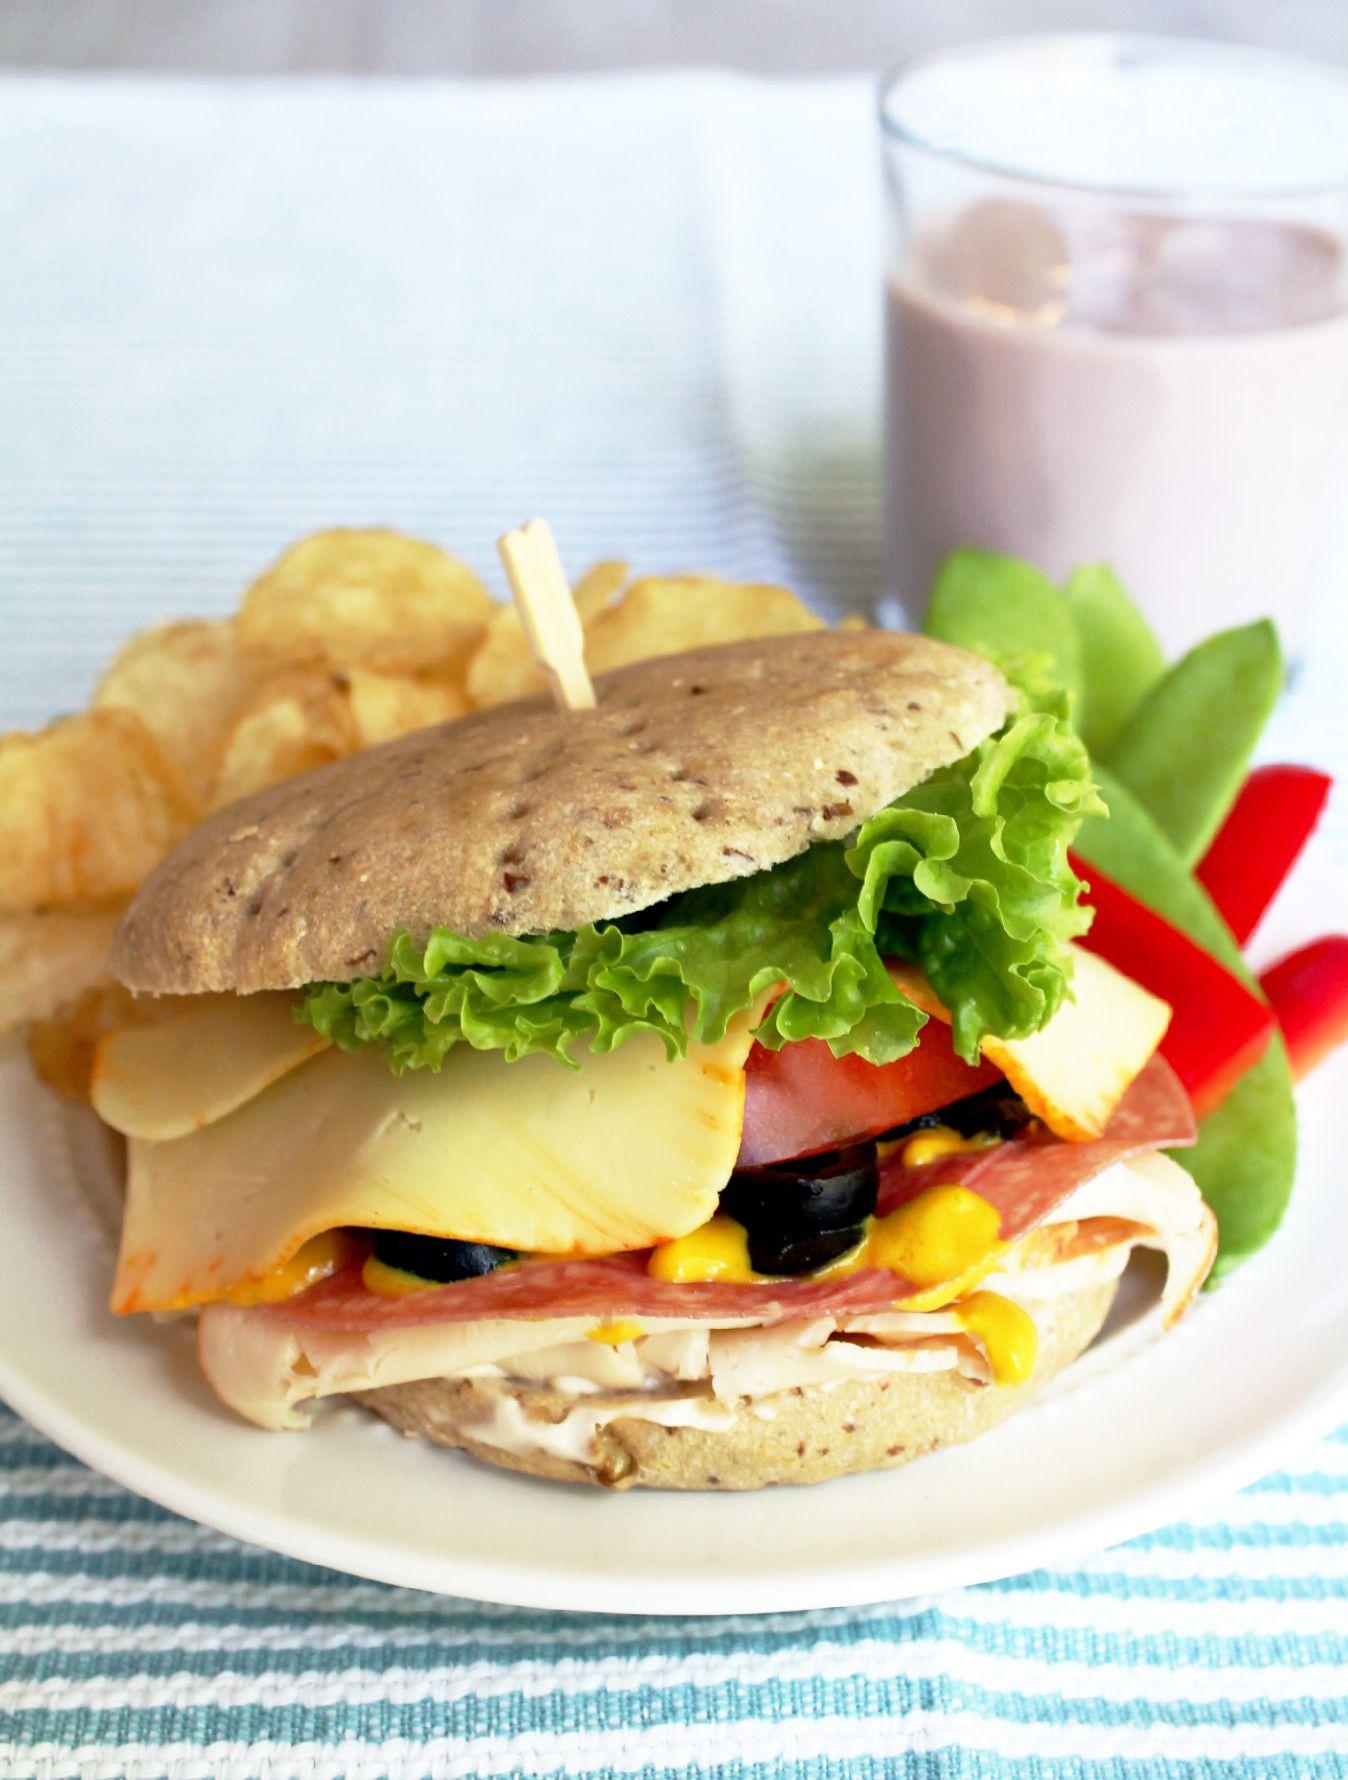 4e9625805ad56db6e7f2d76043b148b1 - Sandwich Recetas